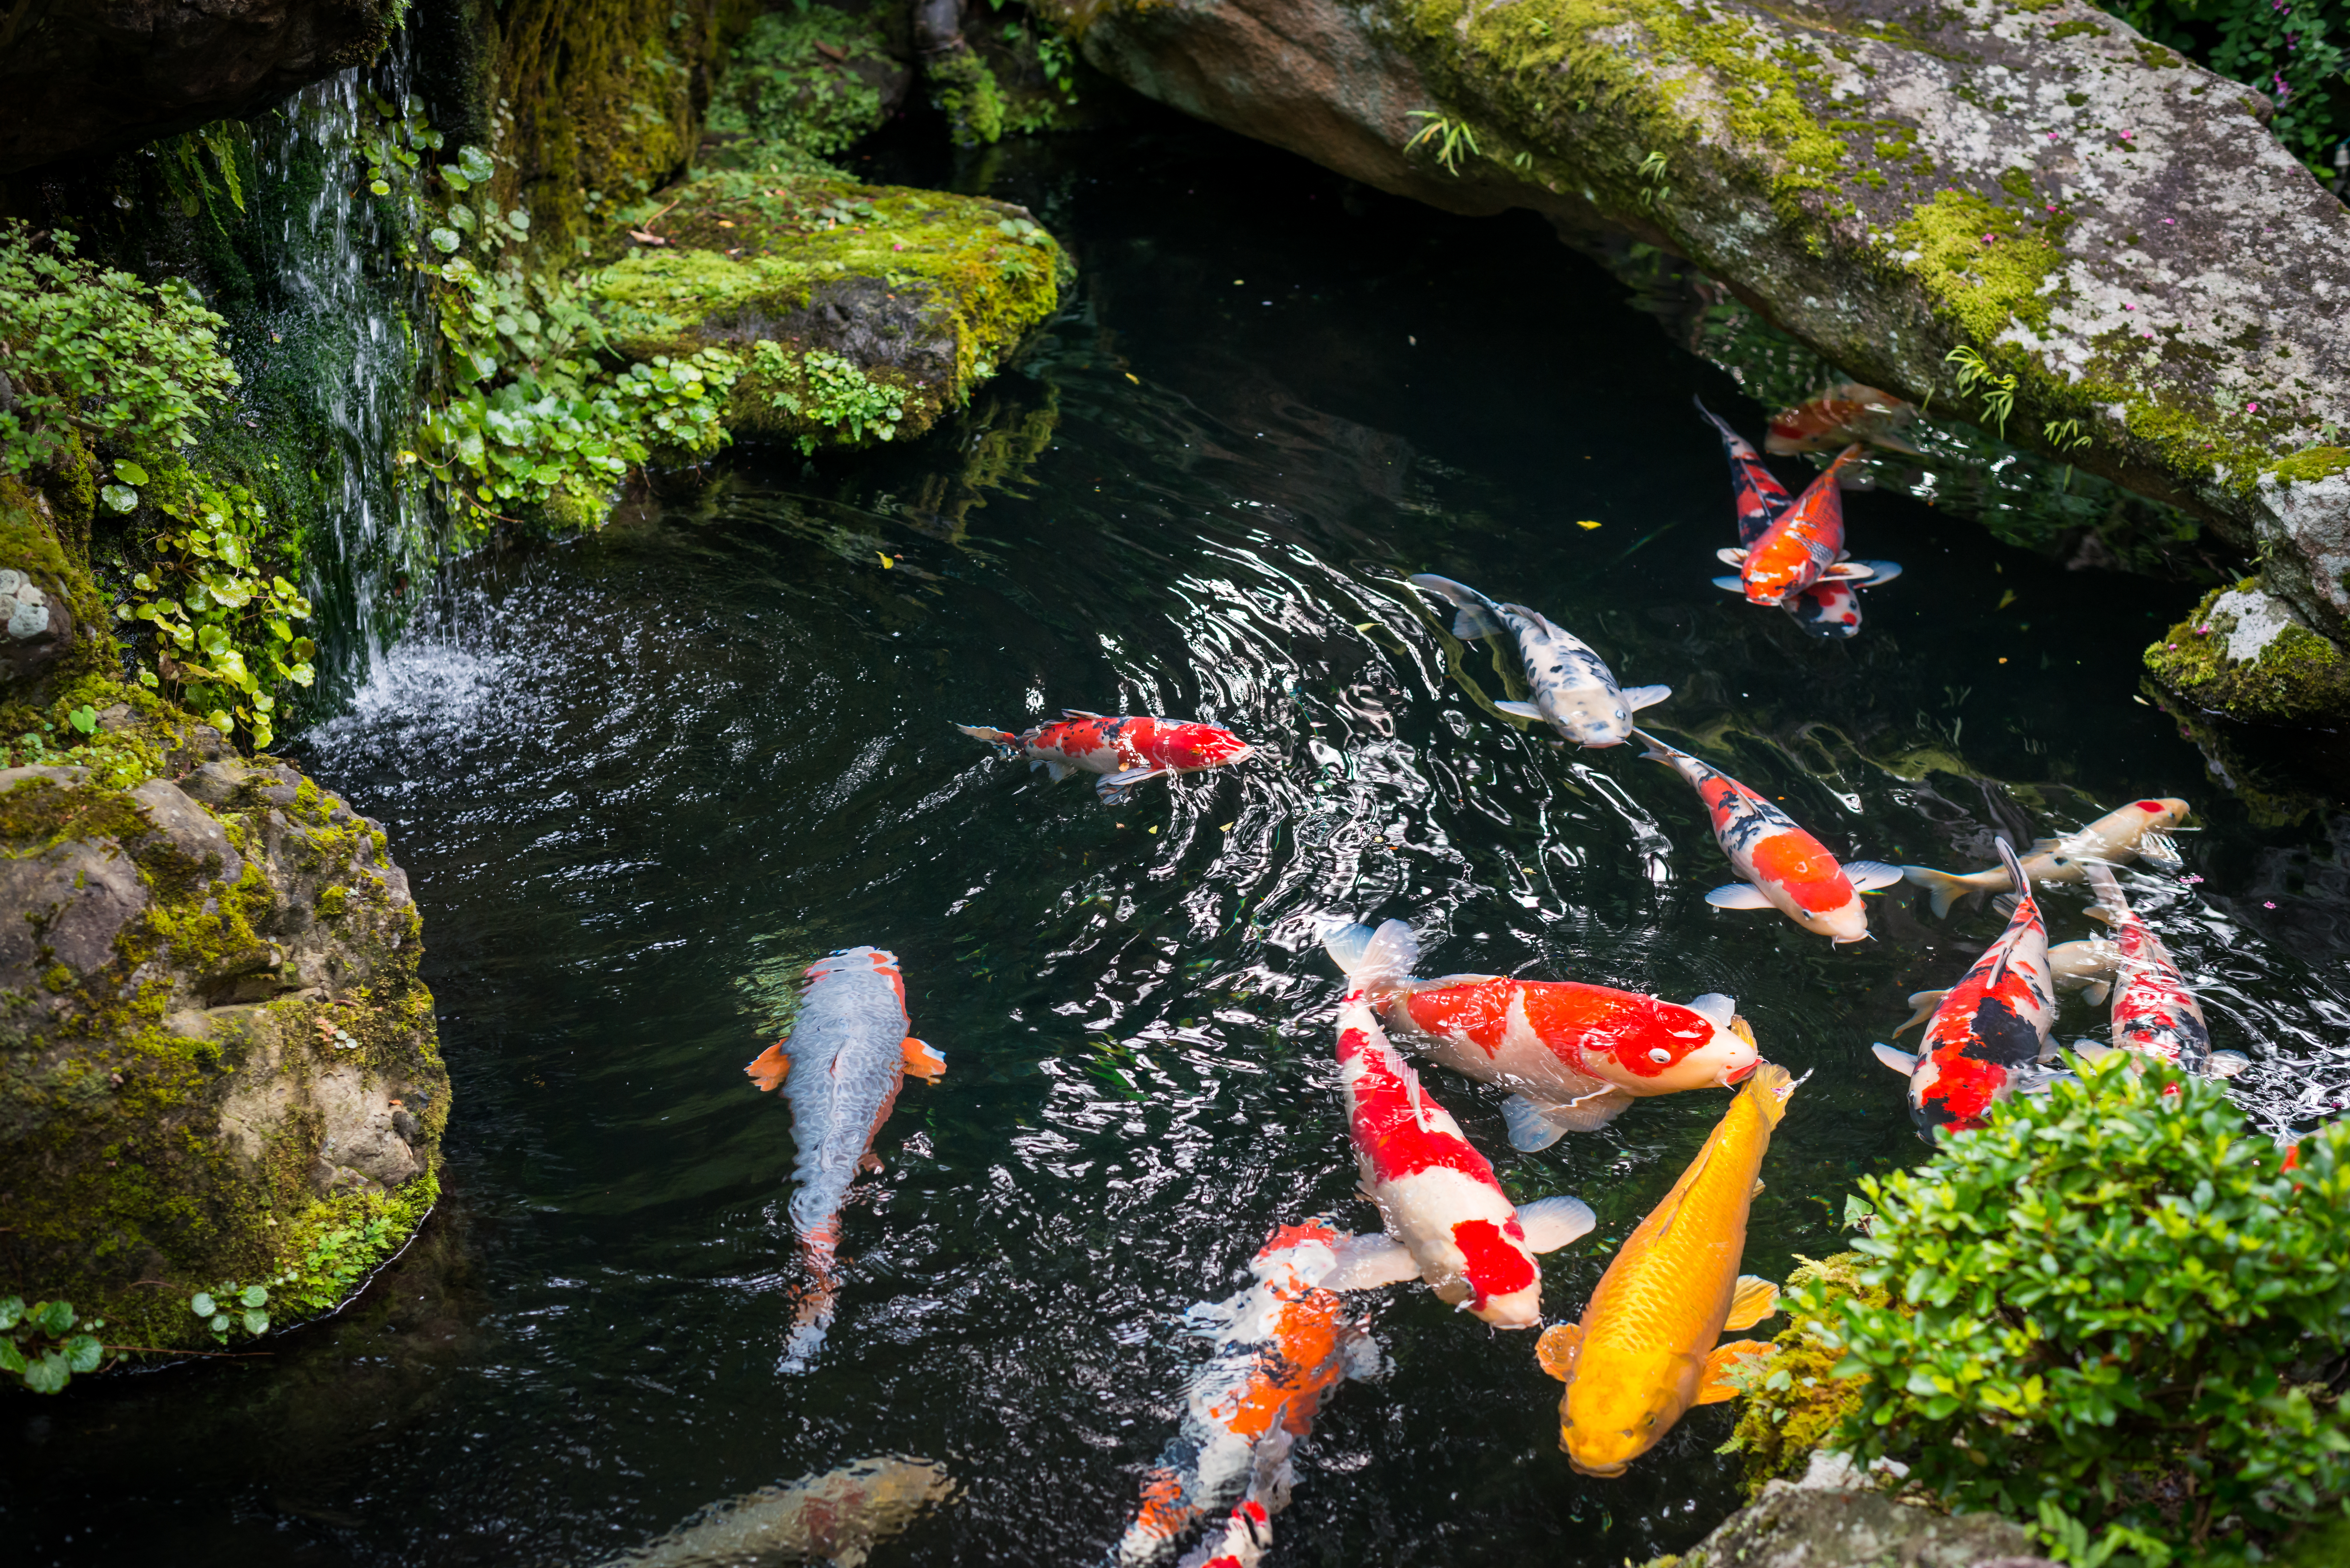 How Do Fish Get Into New Ponds?